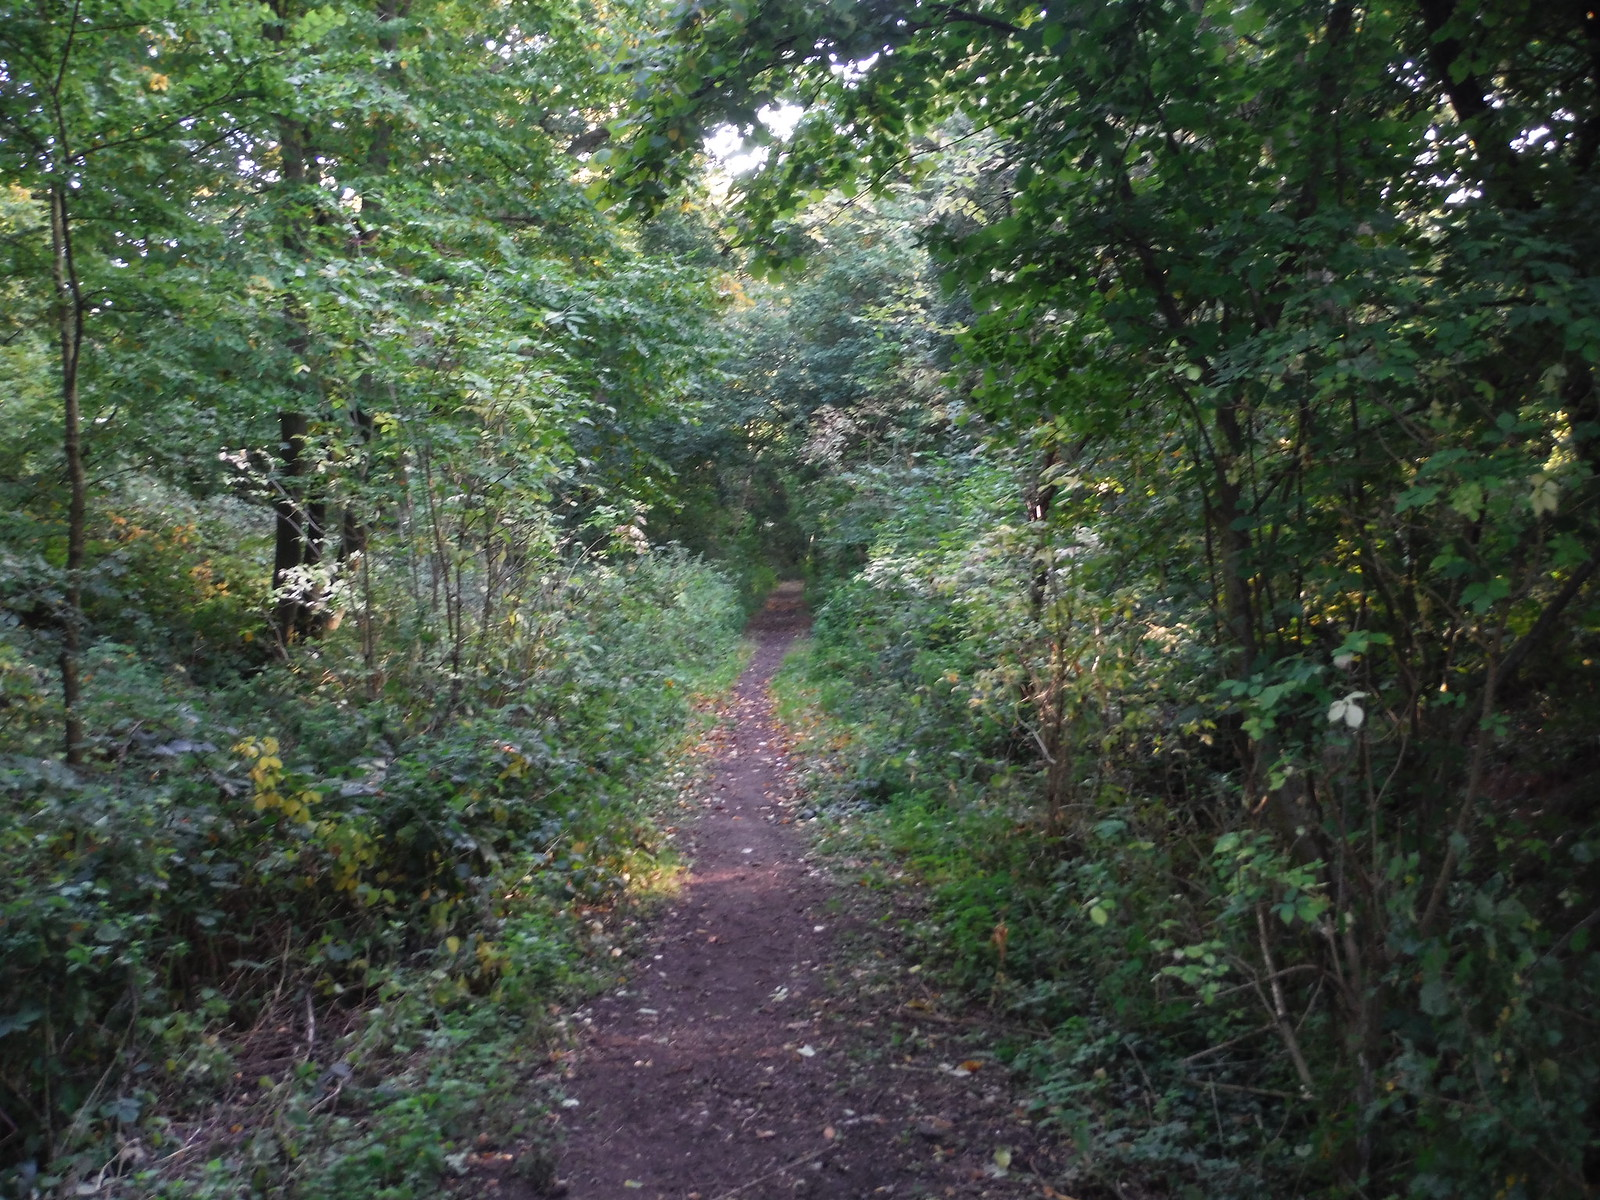 Path through Hawe's Wood SWC Walk 159 South Woodham Ferrers to North Fambridge